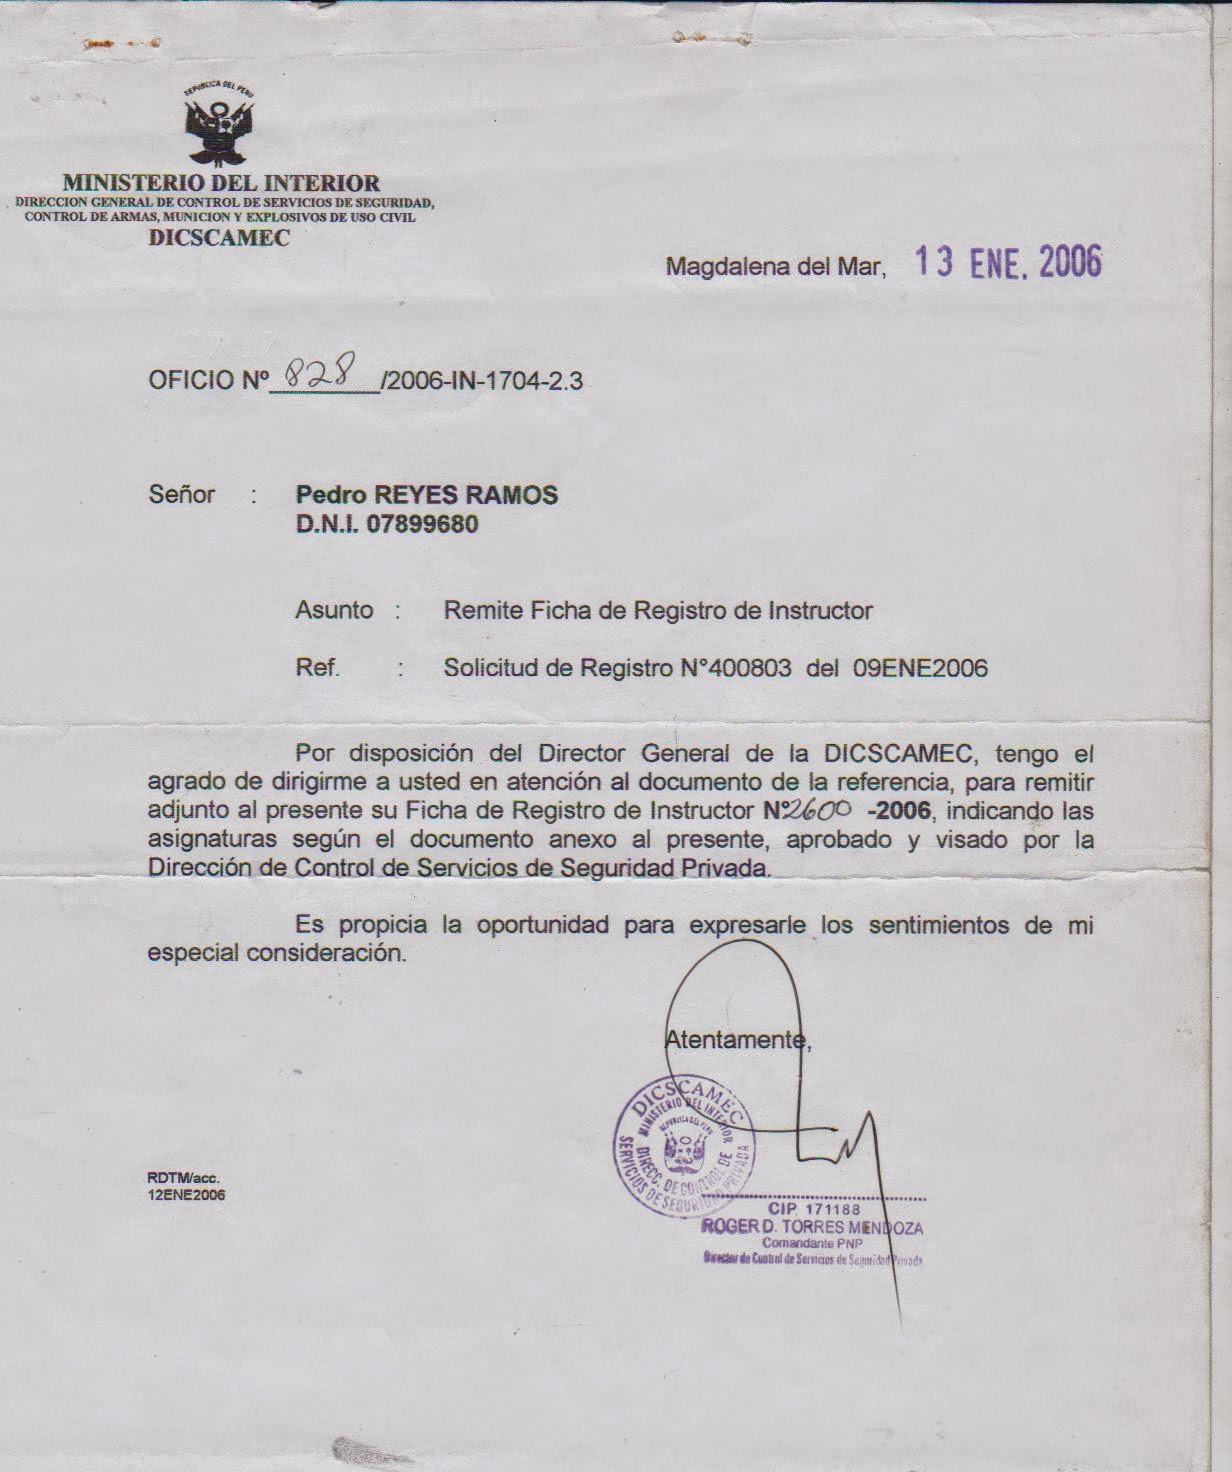 Tiro defensivo peru nuevas denuncias contra la banda tiro for Ministerio del interior peru